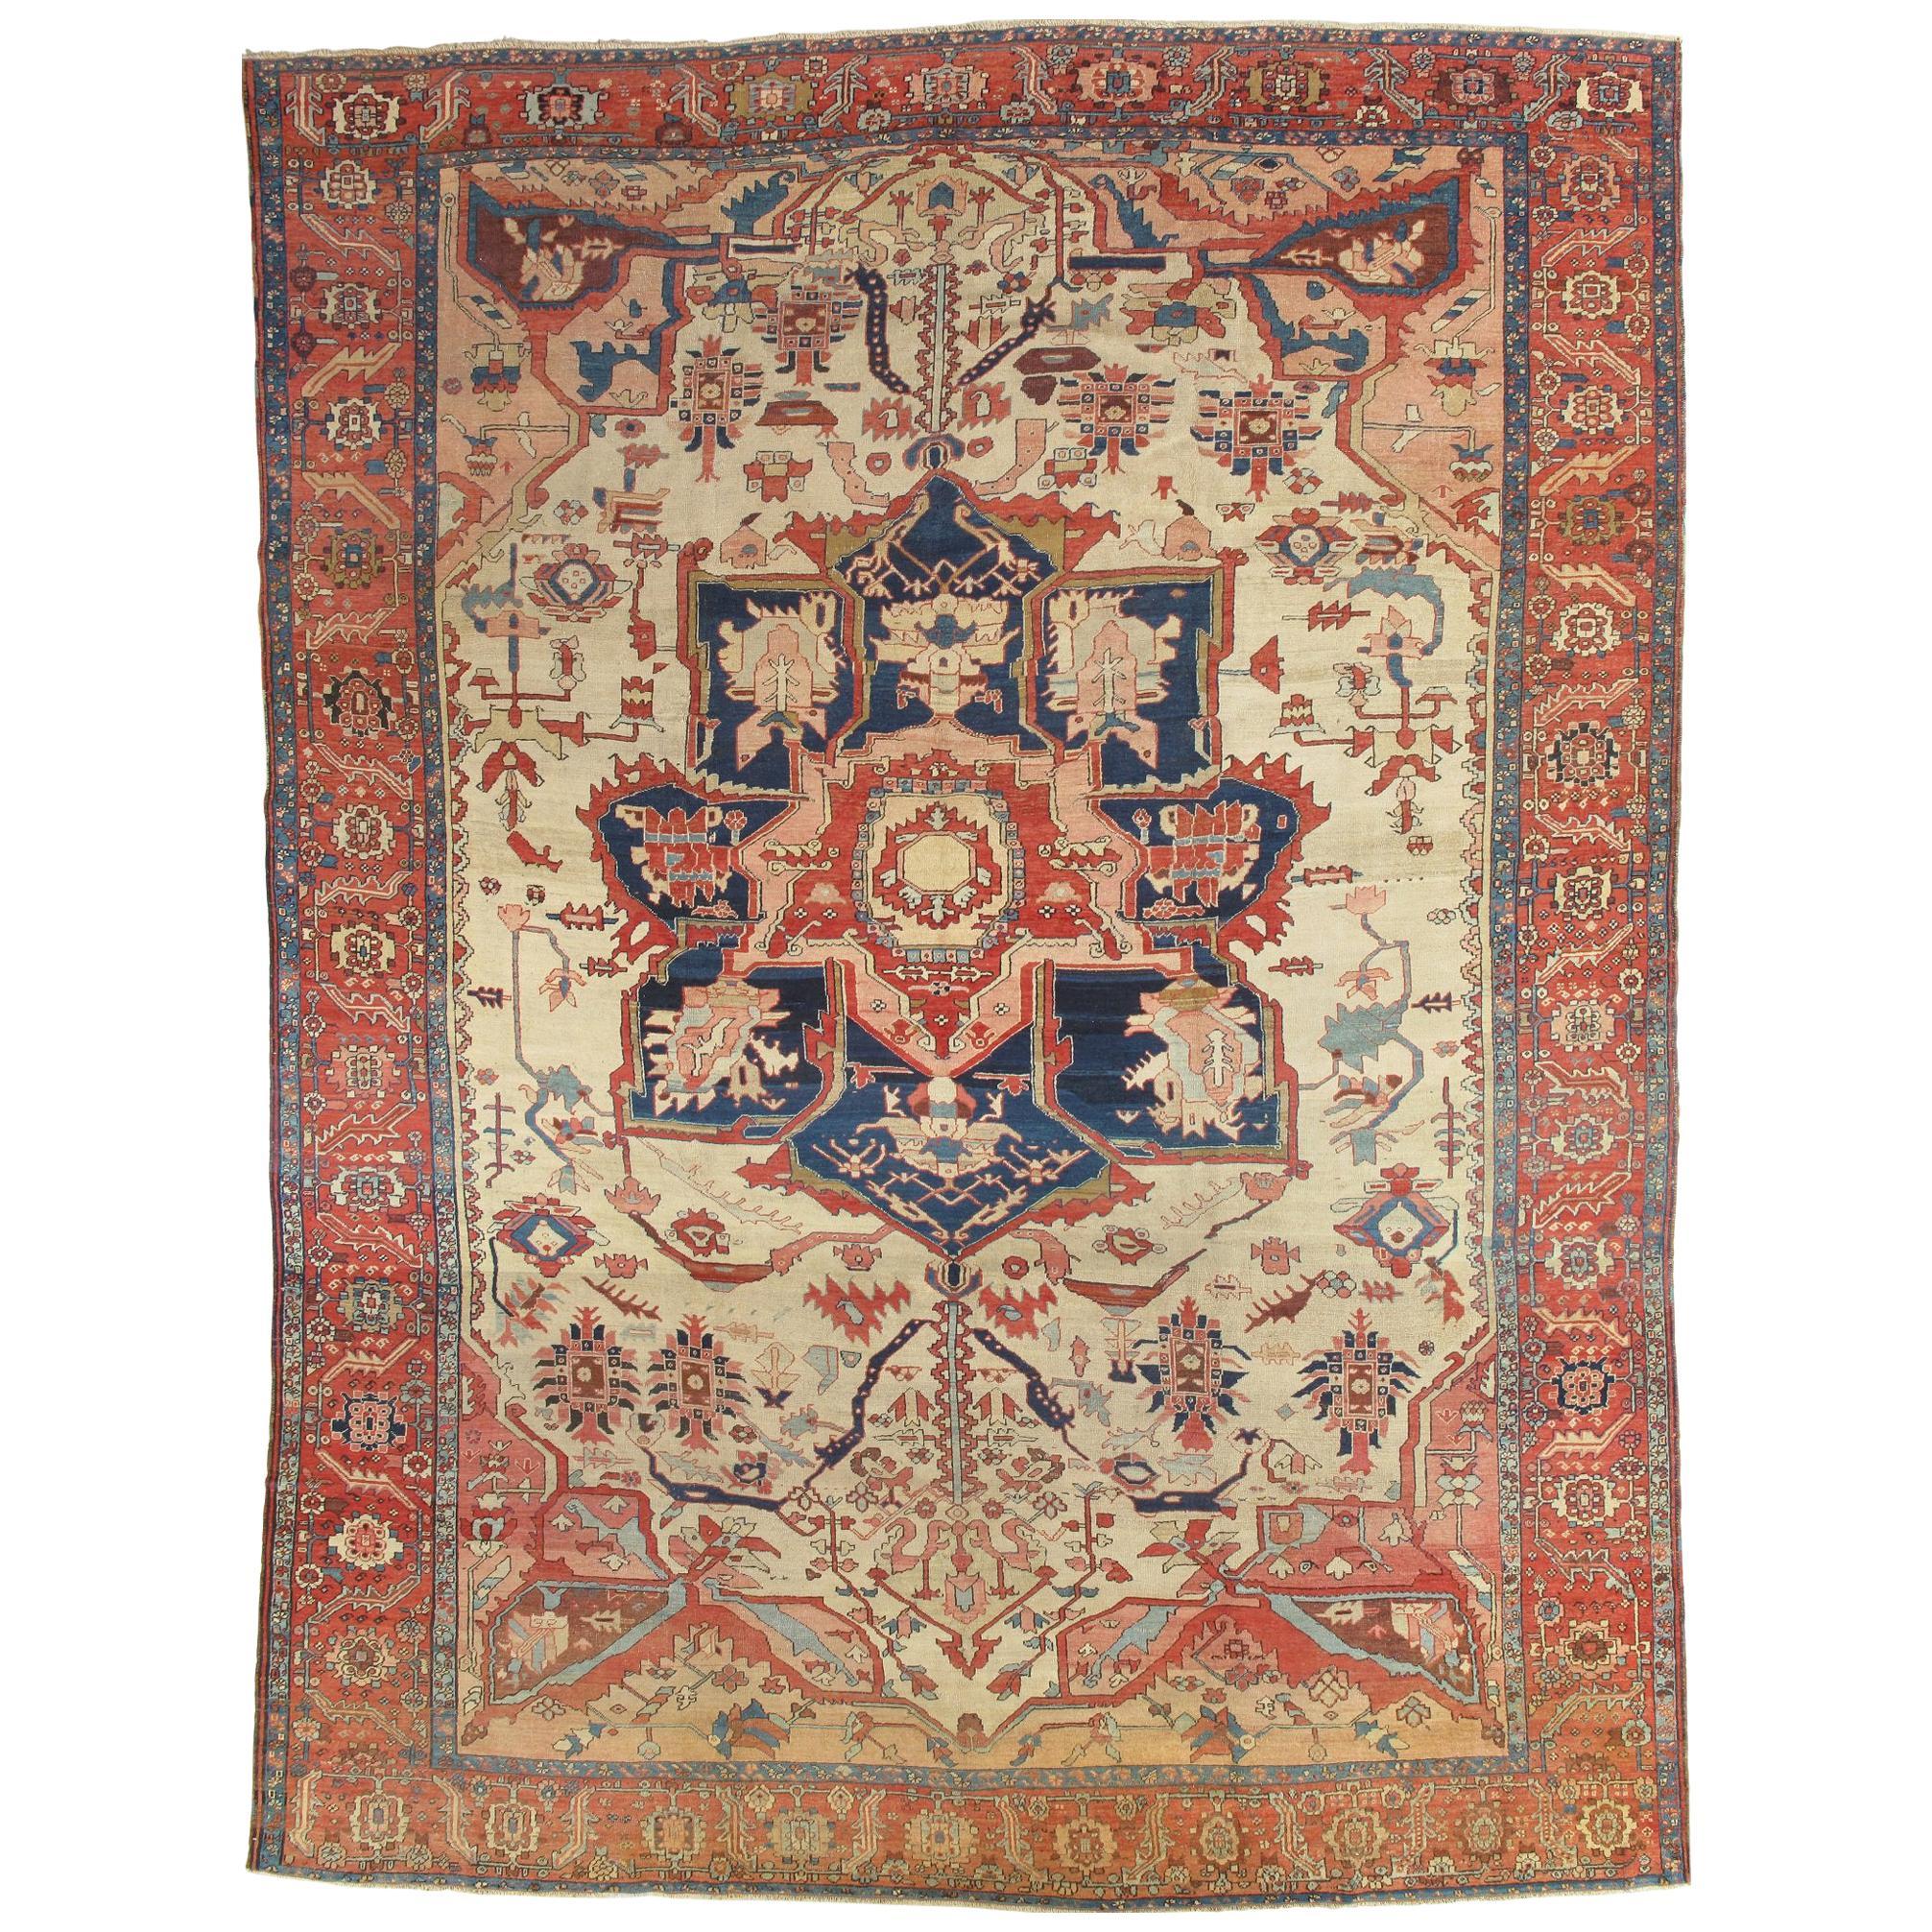 Antique Serapi Carpet, Handmade Wool Oriental Rug, Ivory, Rust, Navy, Light Blue